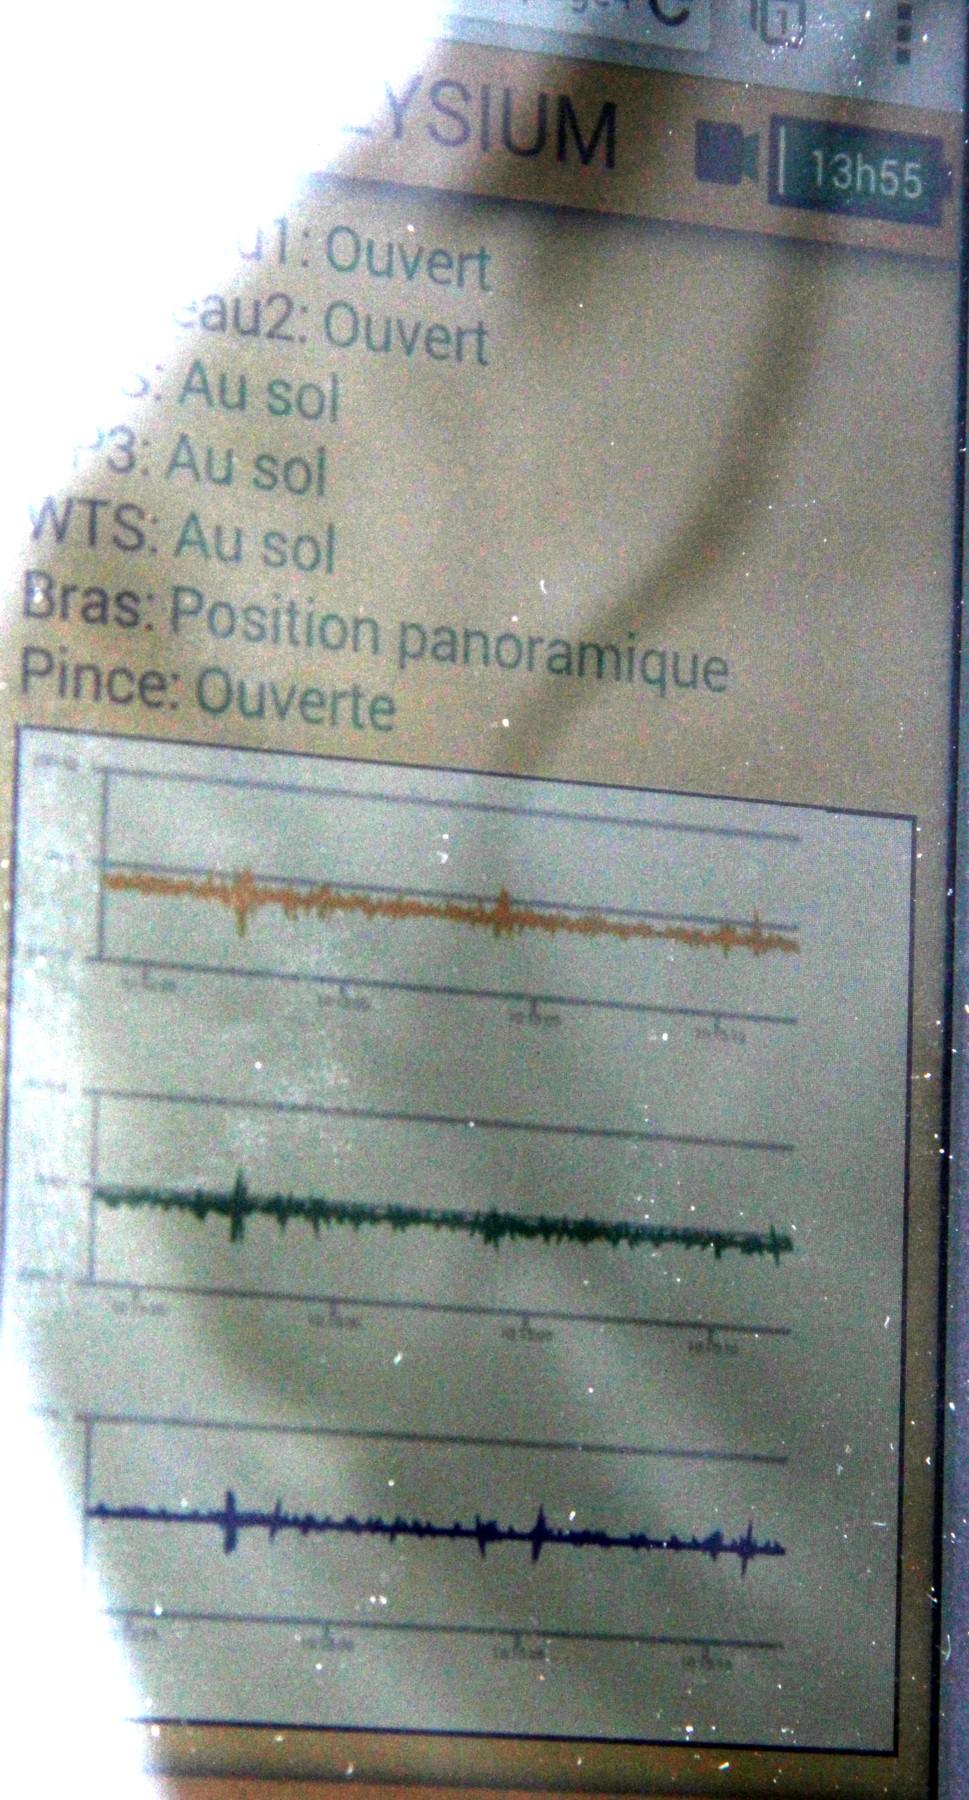 15 06 16 - 10h 15m 56s - bourget cnes maquette insight rec